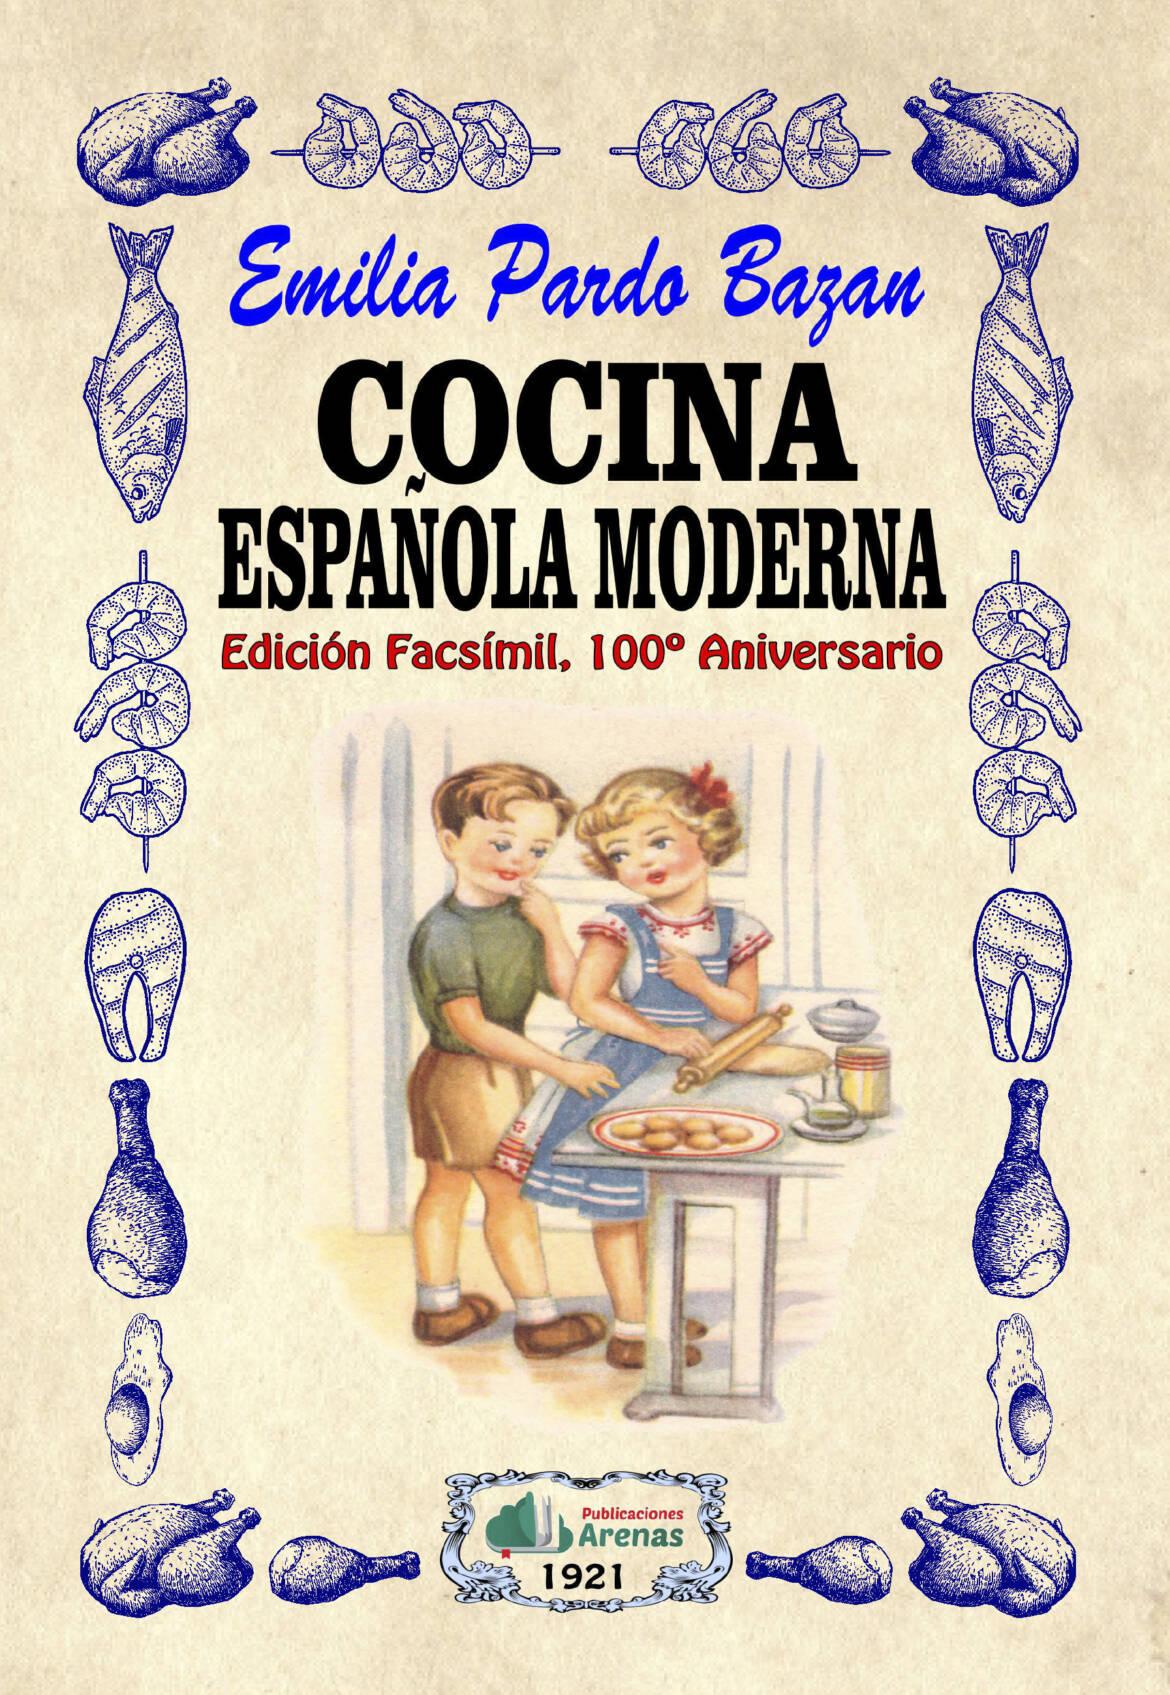 Portadas-Cocina-Emilia-Pardo-Bazan-2.jpg